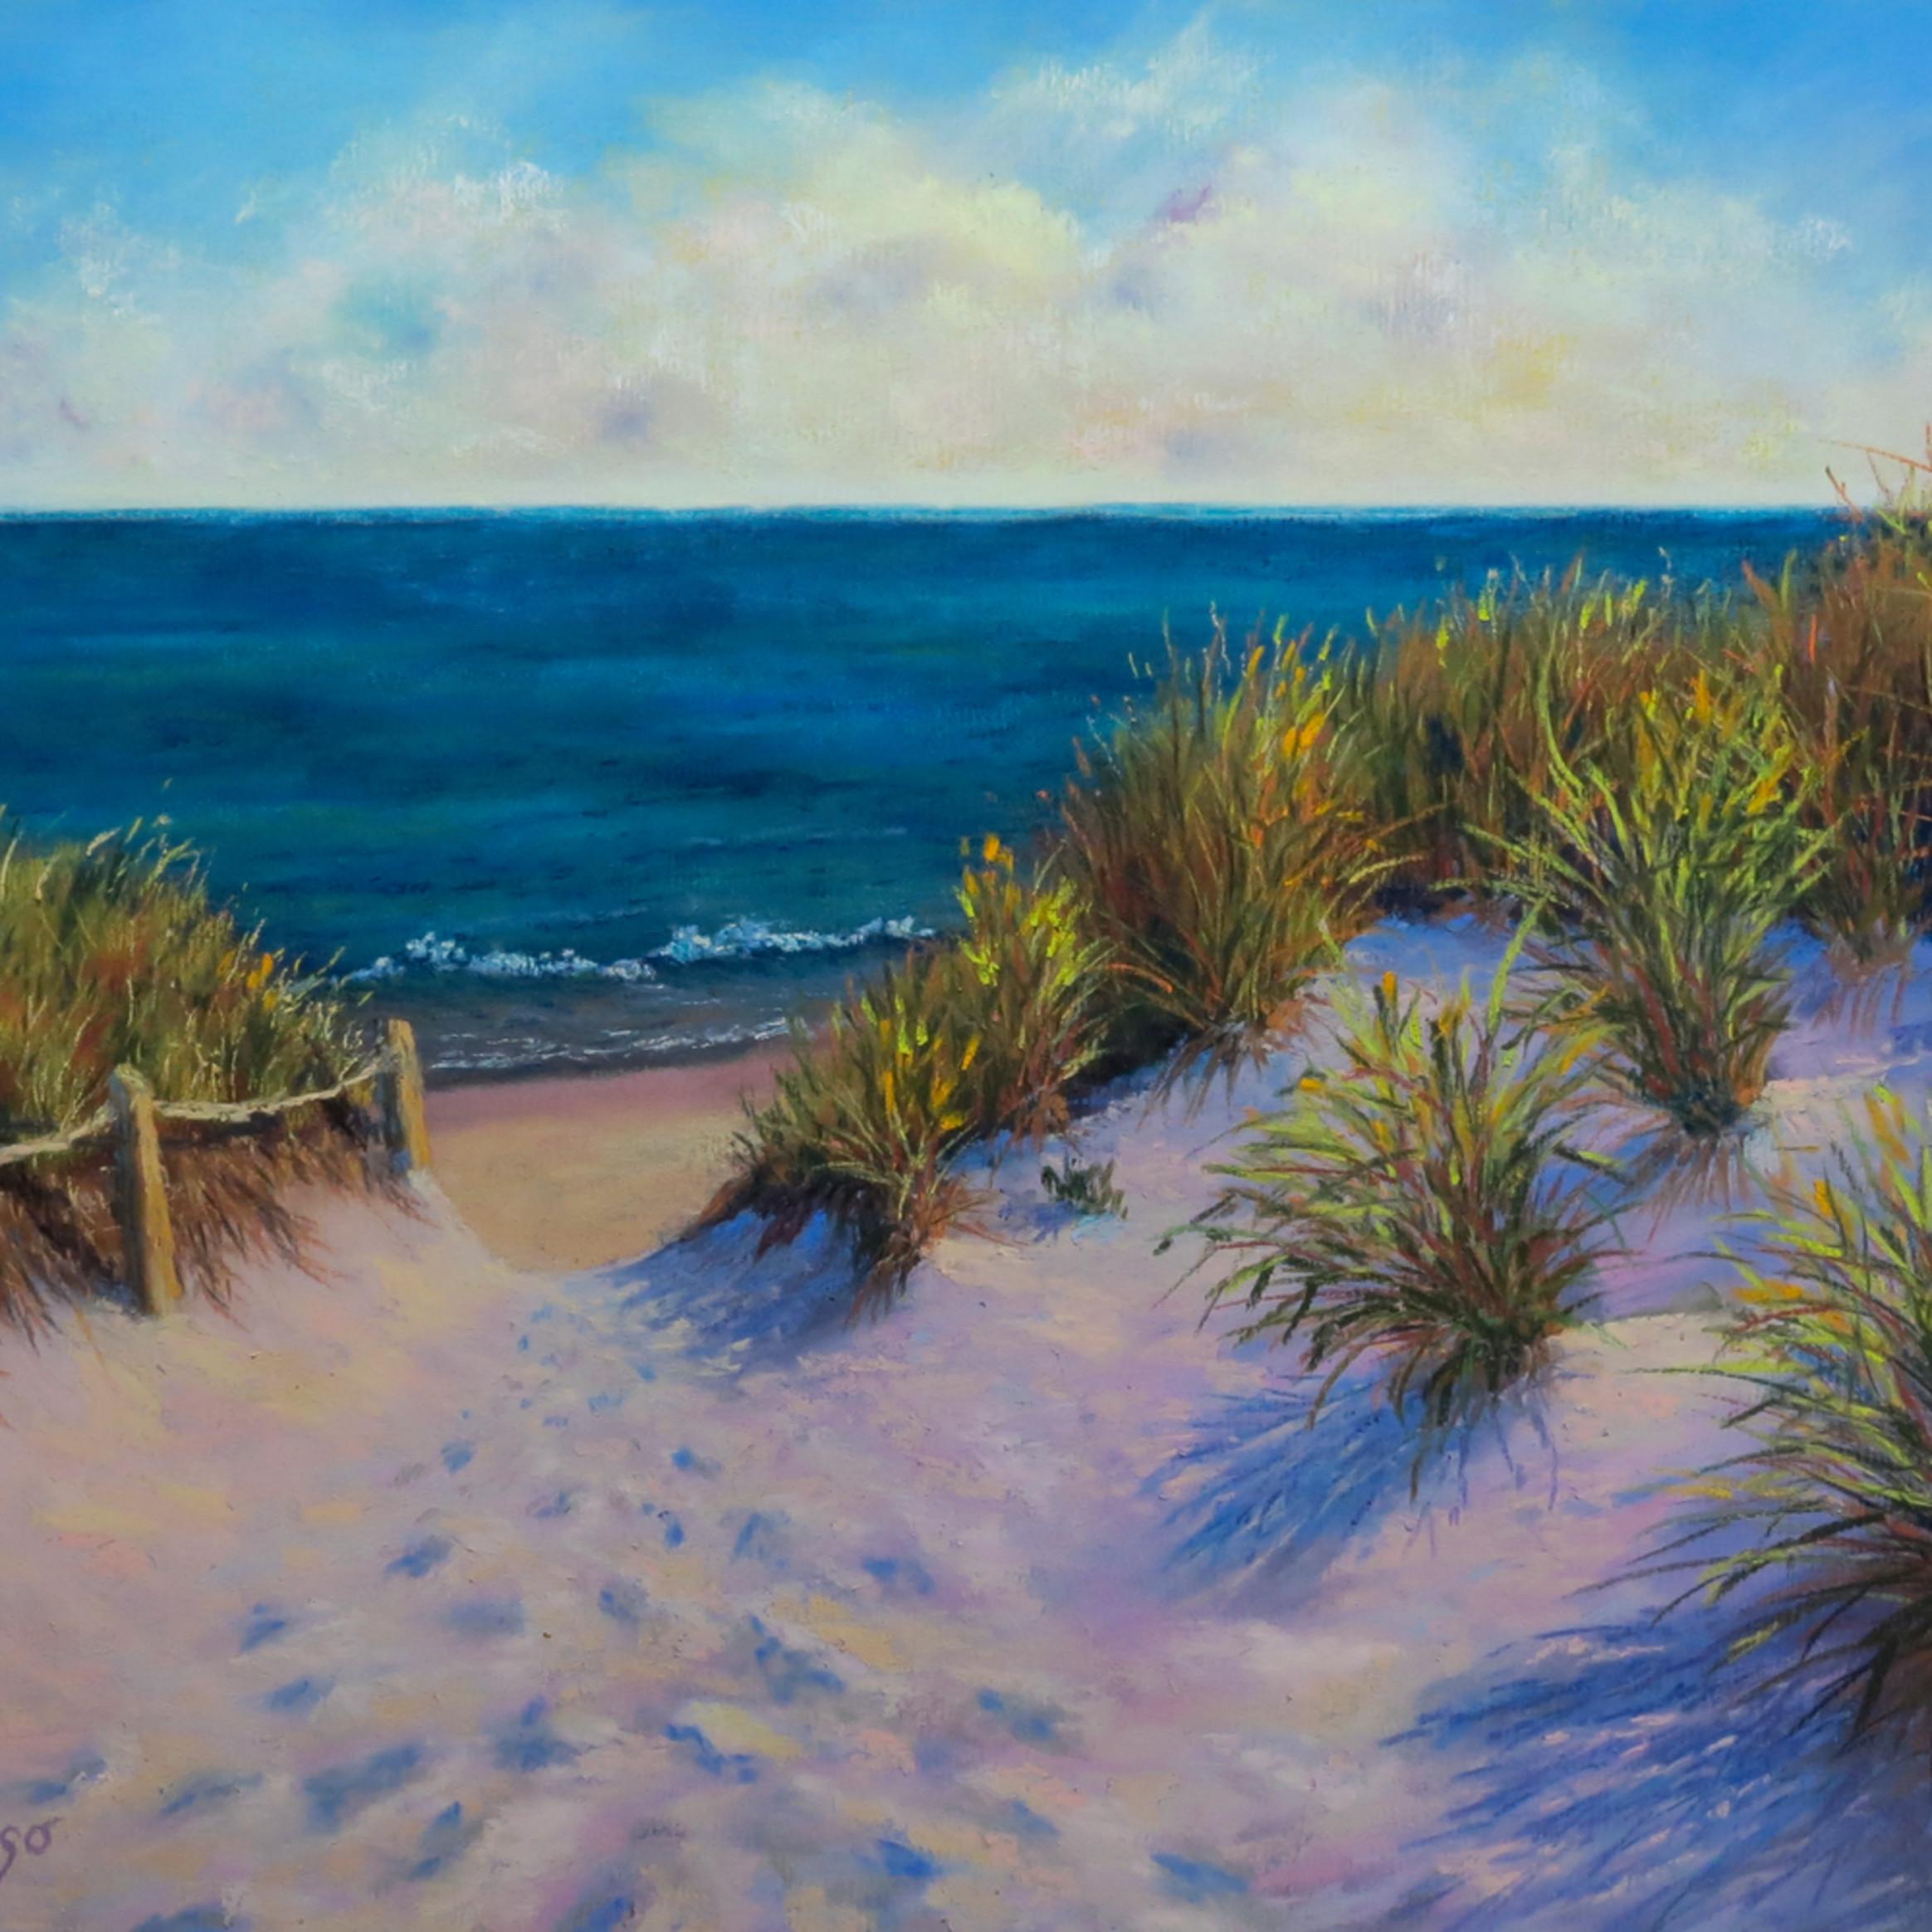 Cape cod dunes crrg0a